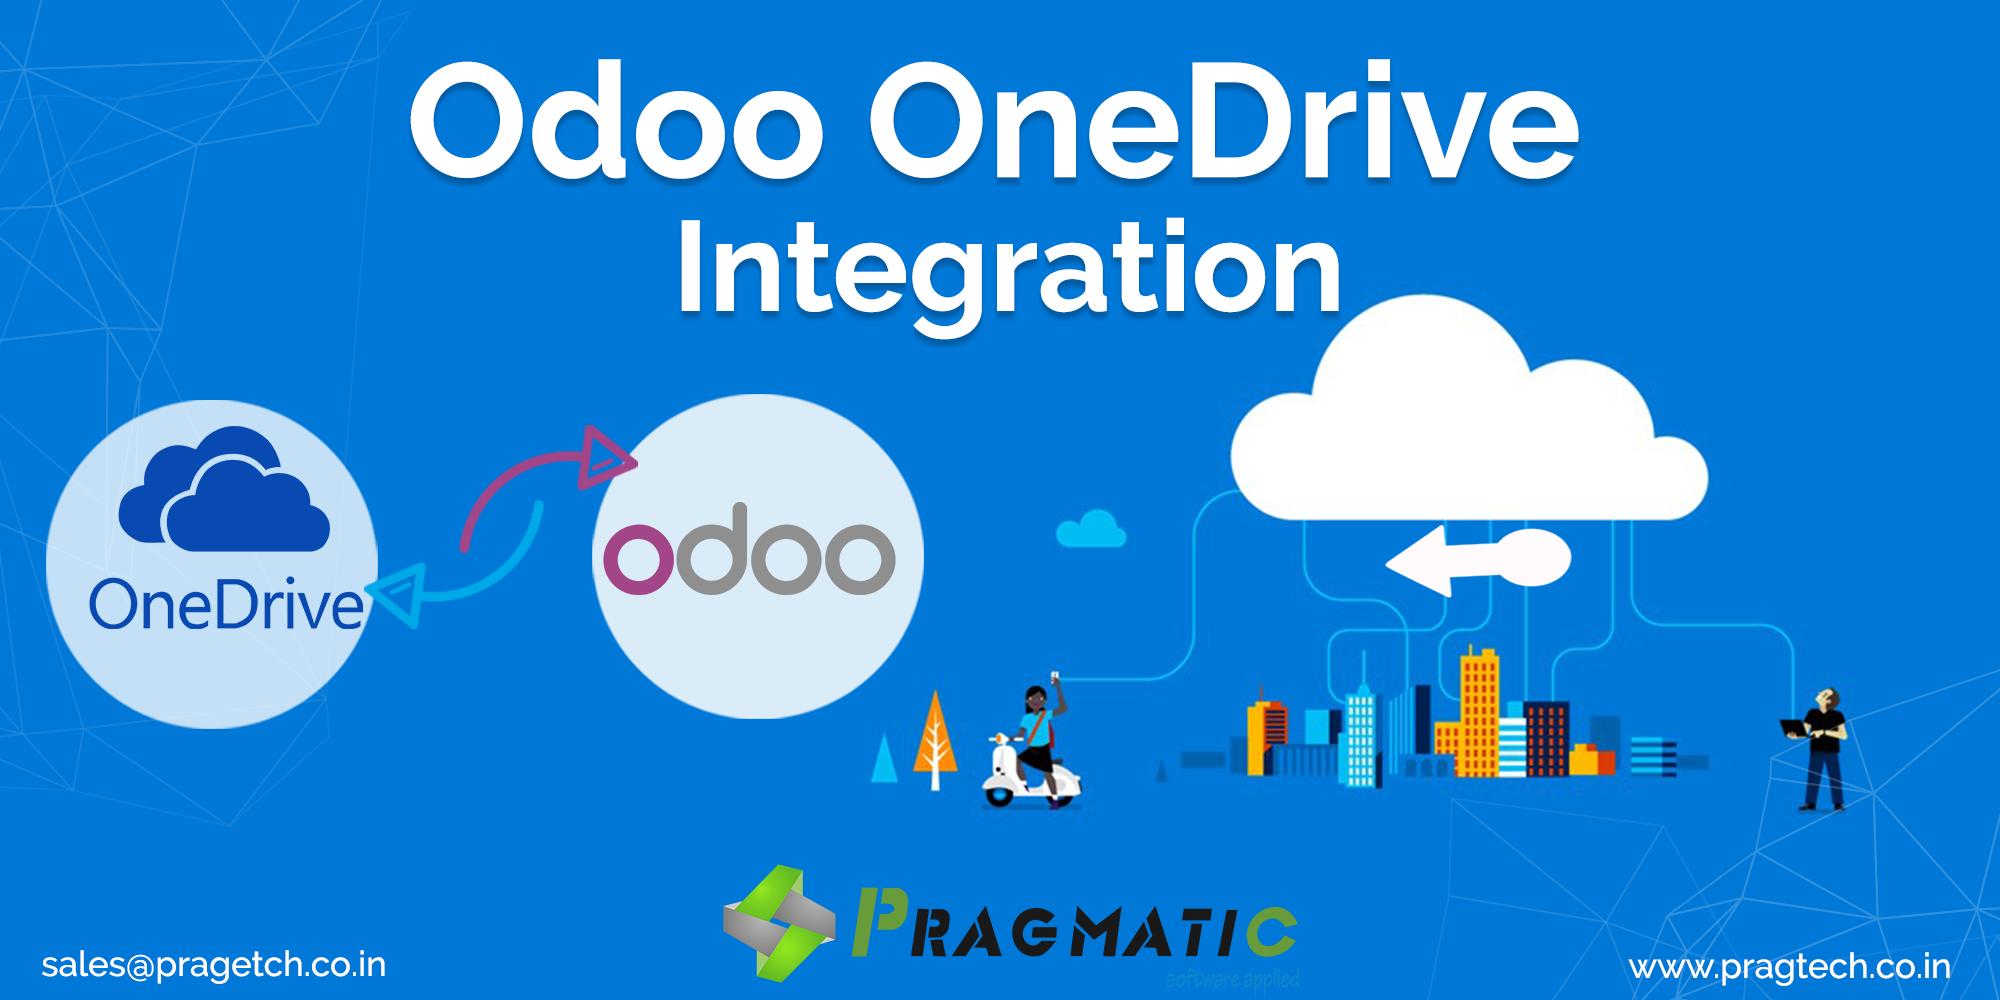 Odoo OneDrive Integration App